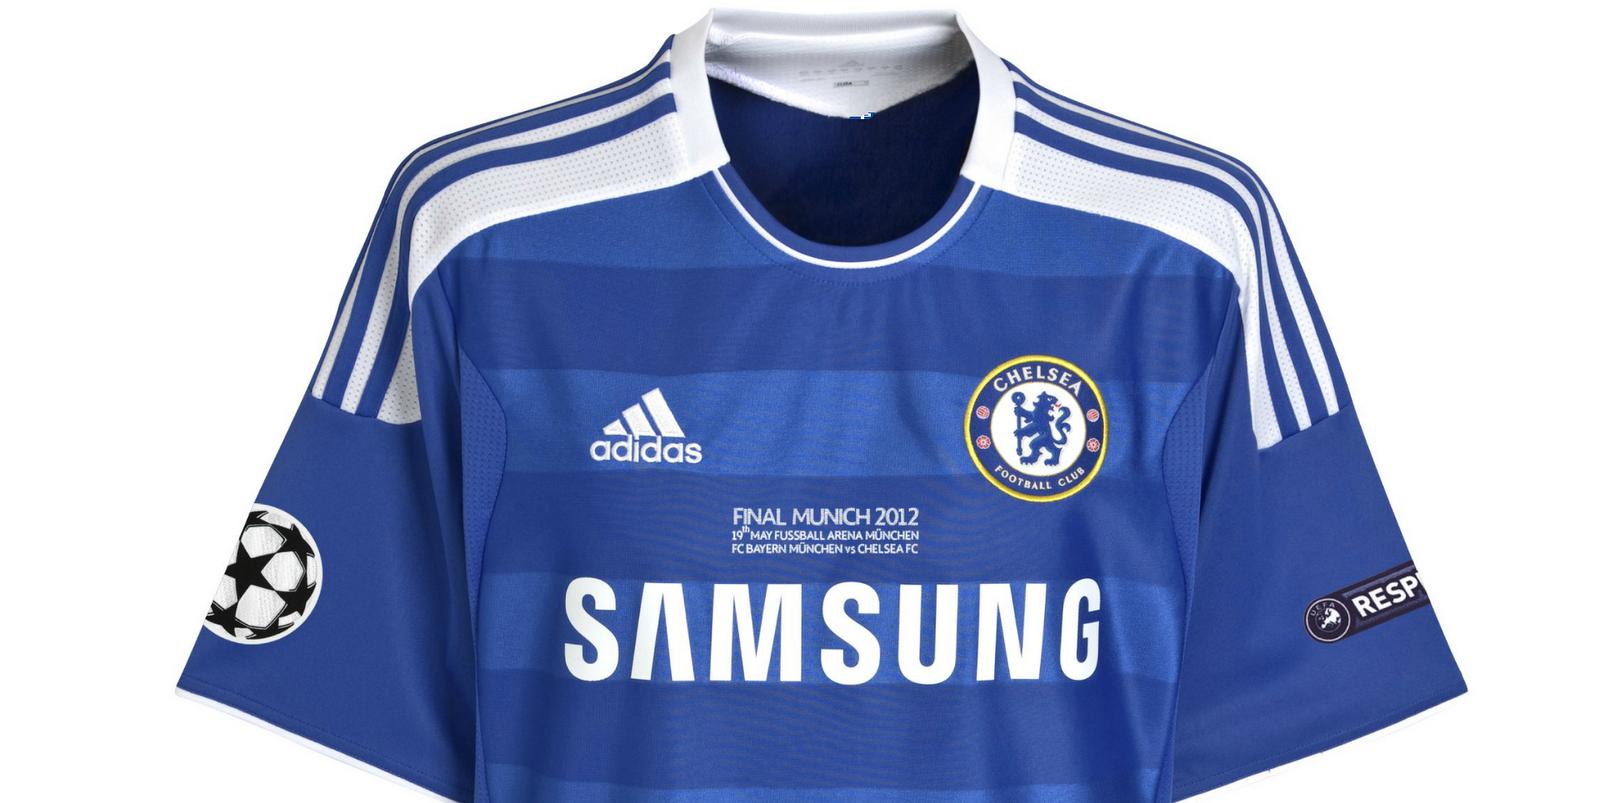 310e9e1314d01 FutCamisas  Camisa Adidas Chelsea UEFA Champions League Final Munich ...